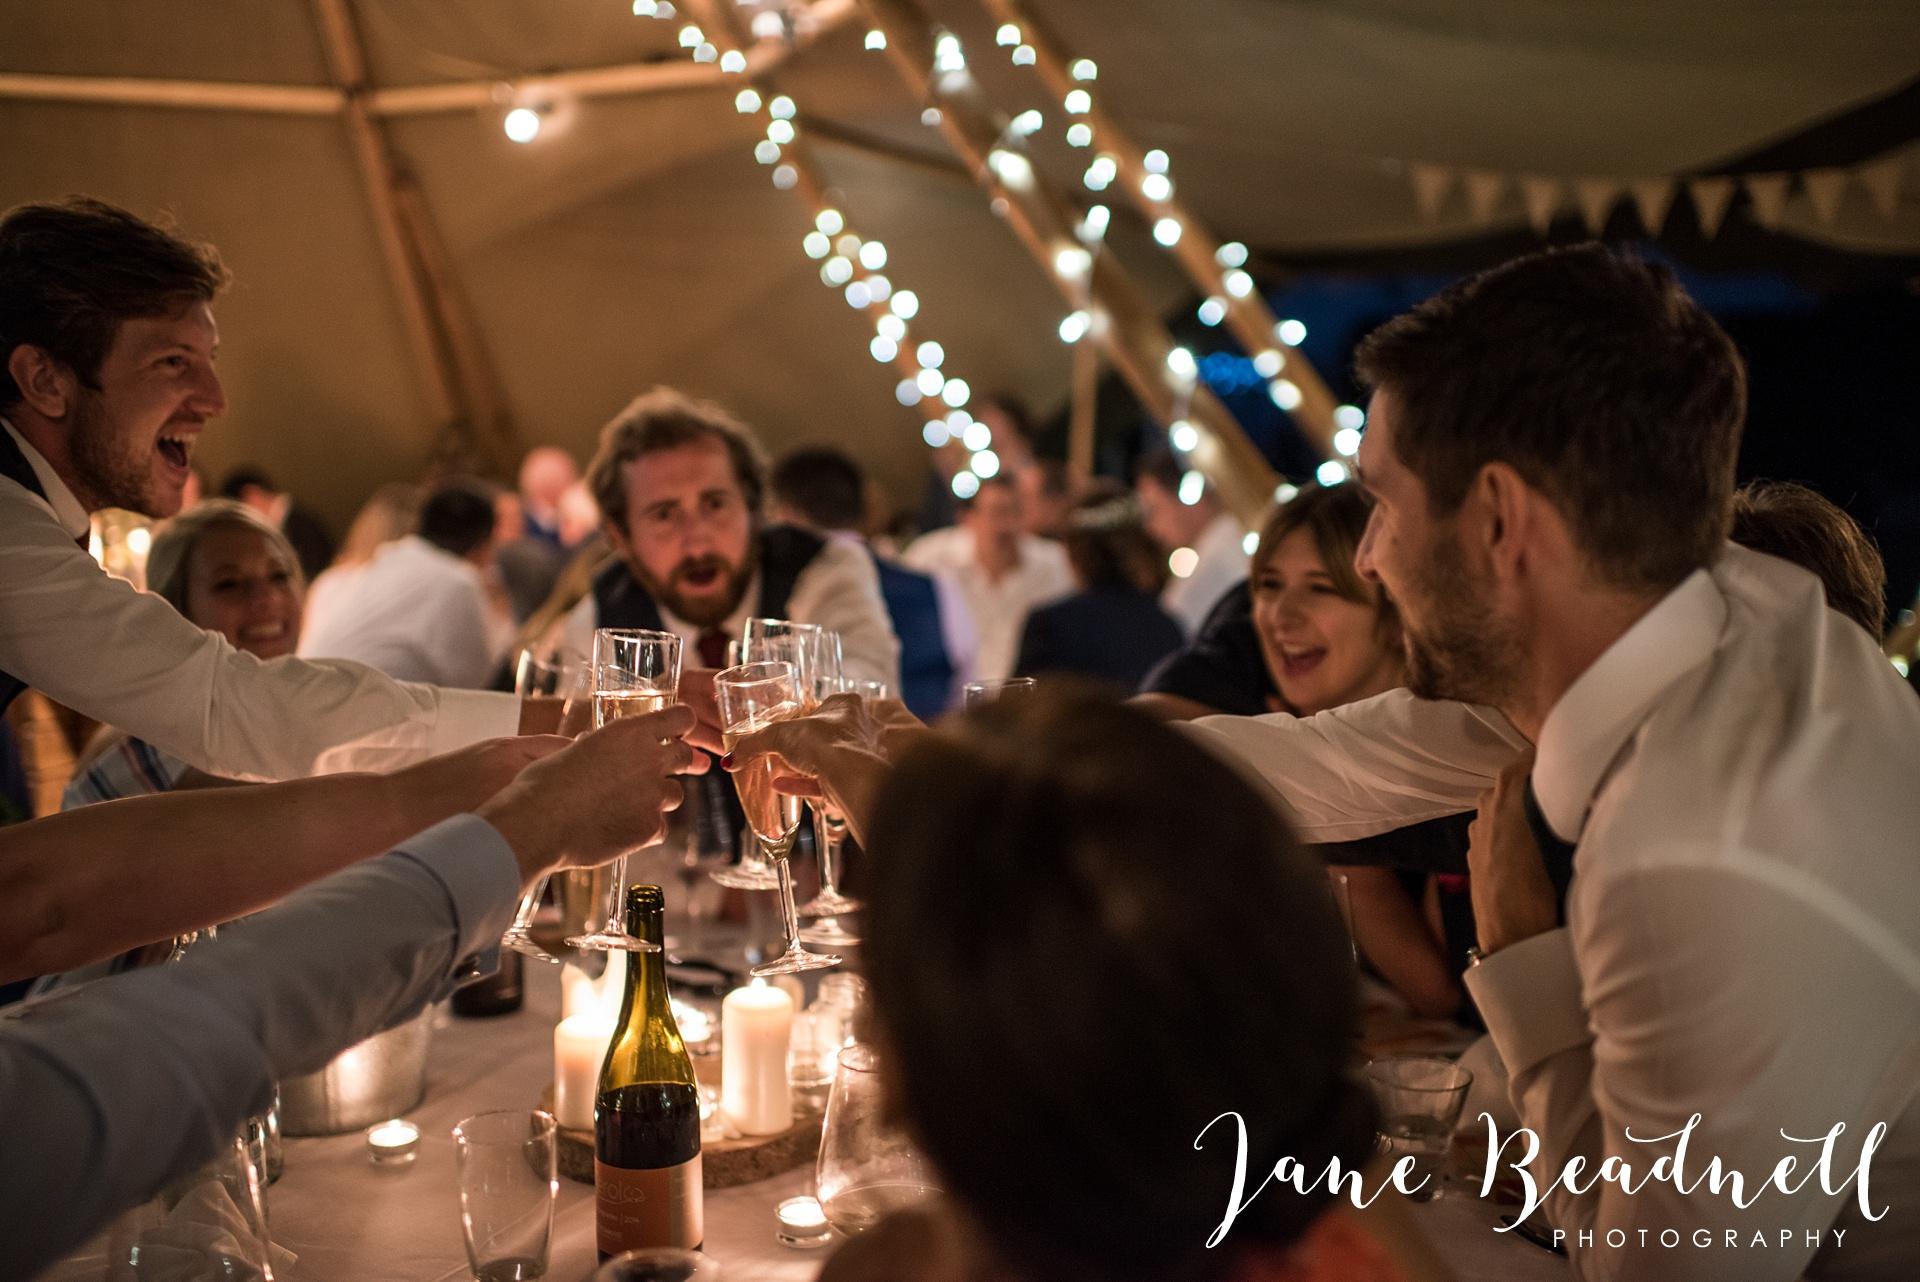 fine-art-wedding-photographer-jane-beadnell-yorkshire-wedding-photographer_0147